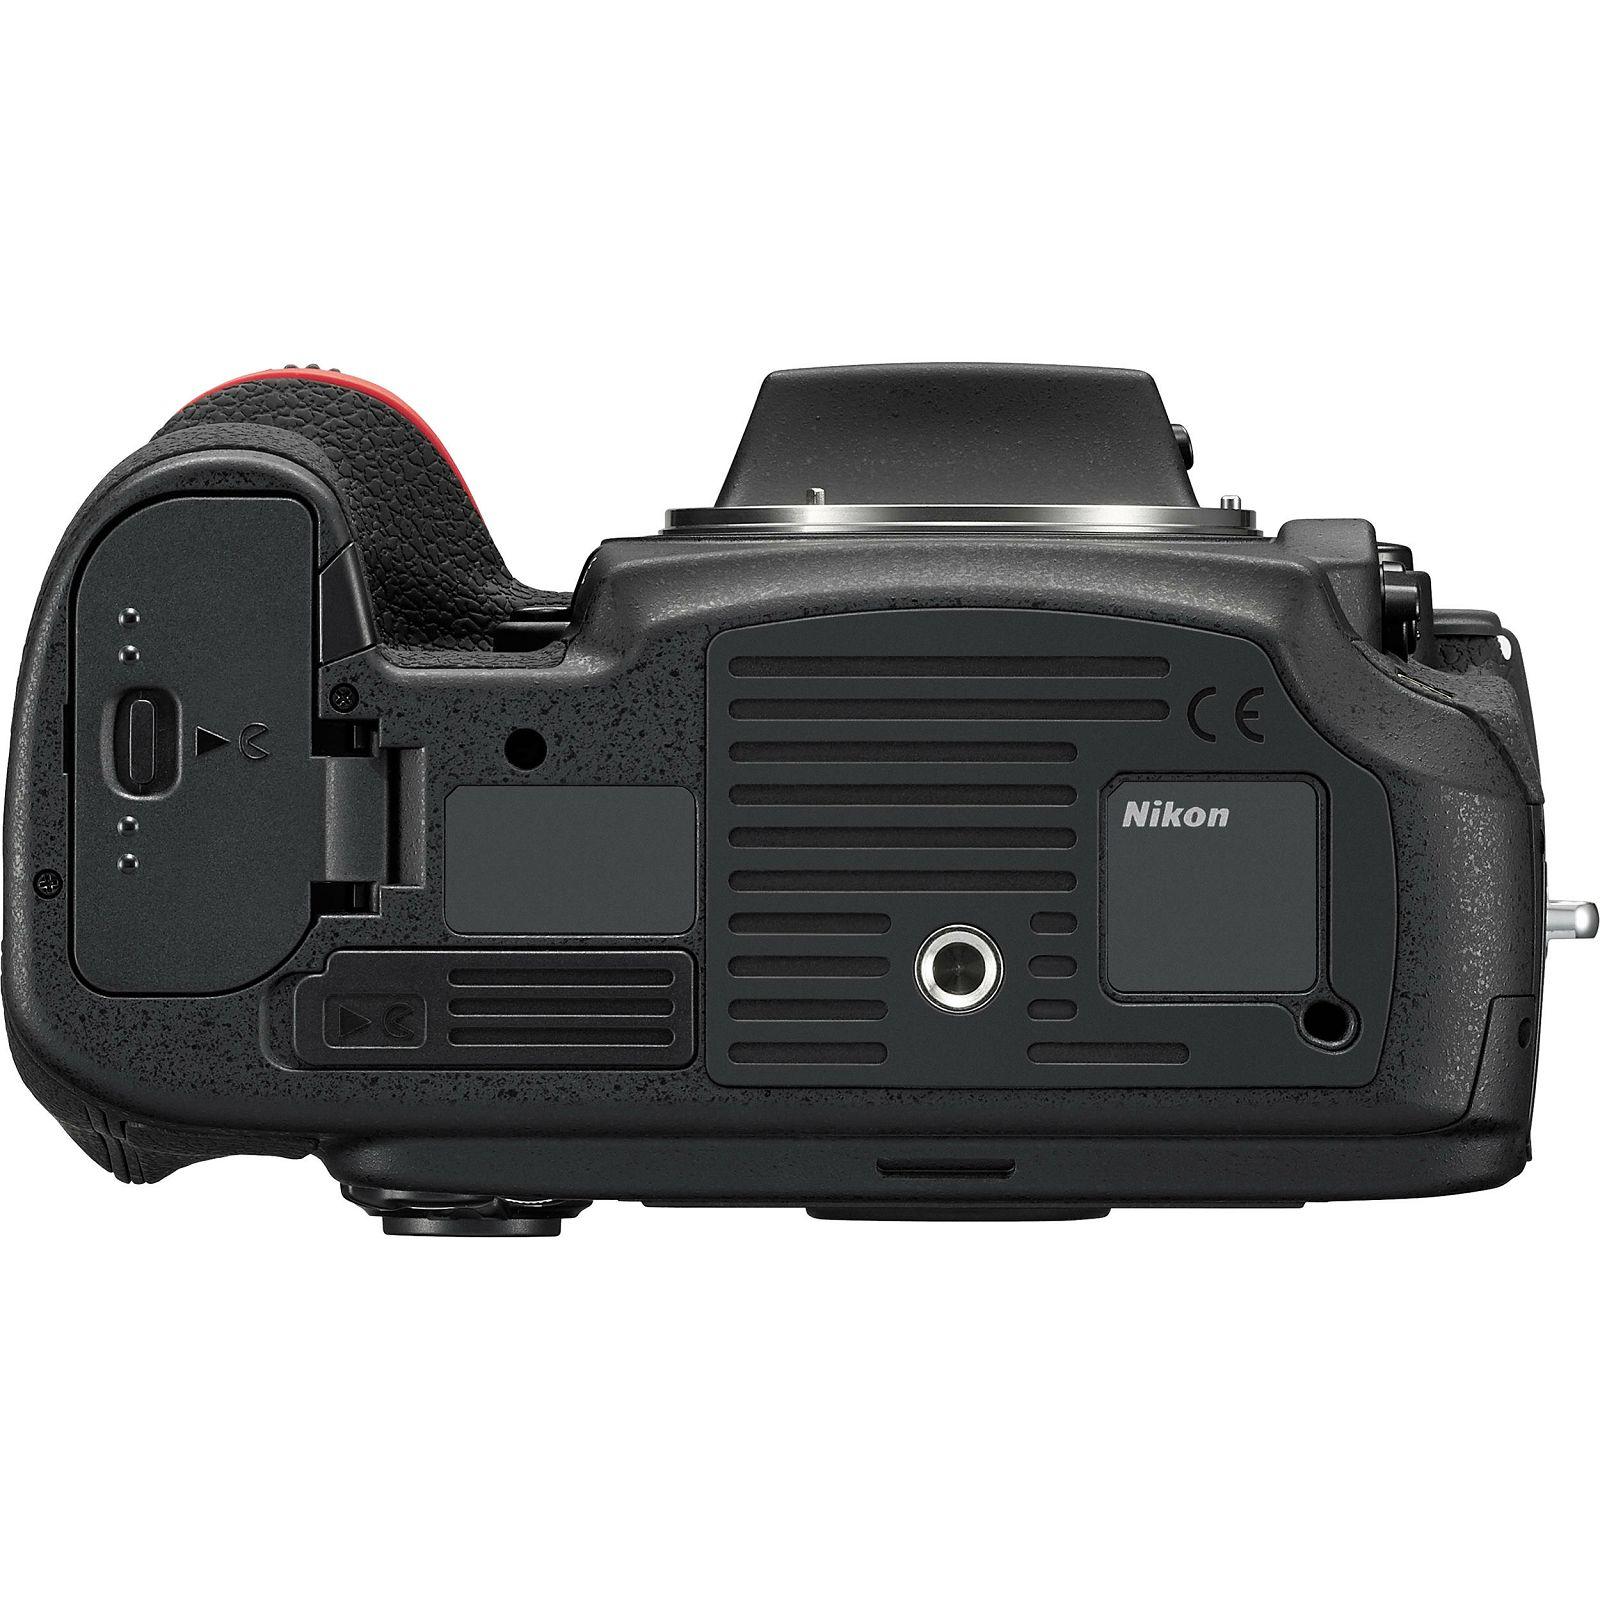 Nikon D810A Body FX Full Frame DSLR digitalni fotoaparat (VBA411AE)